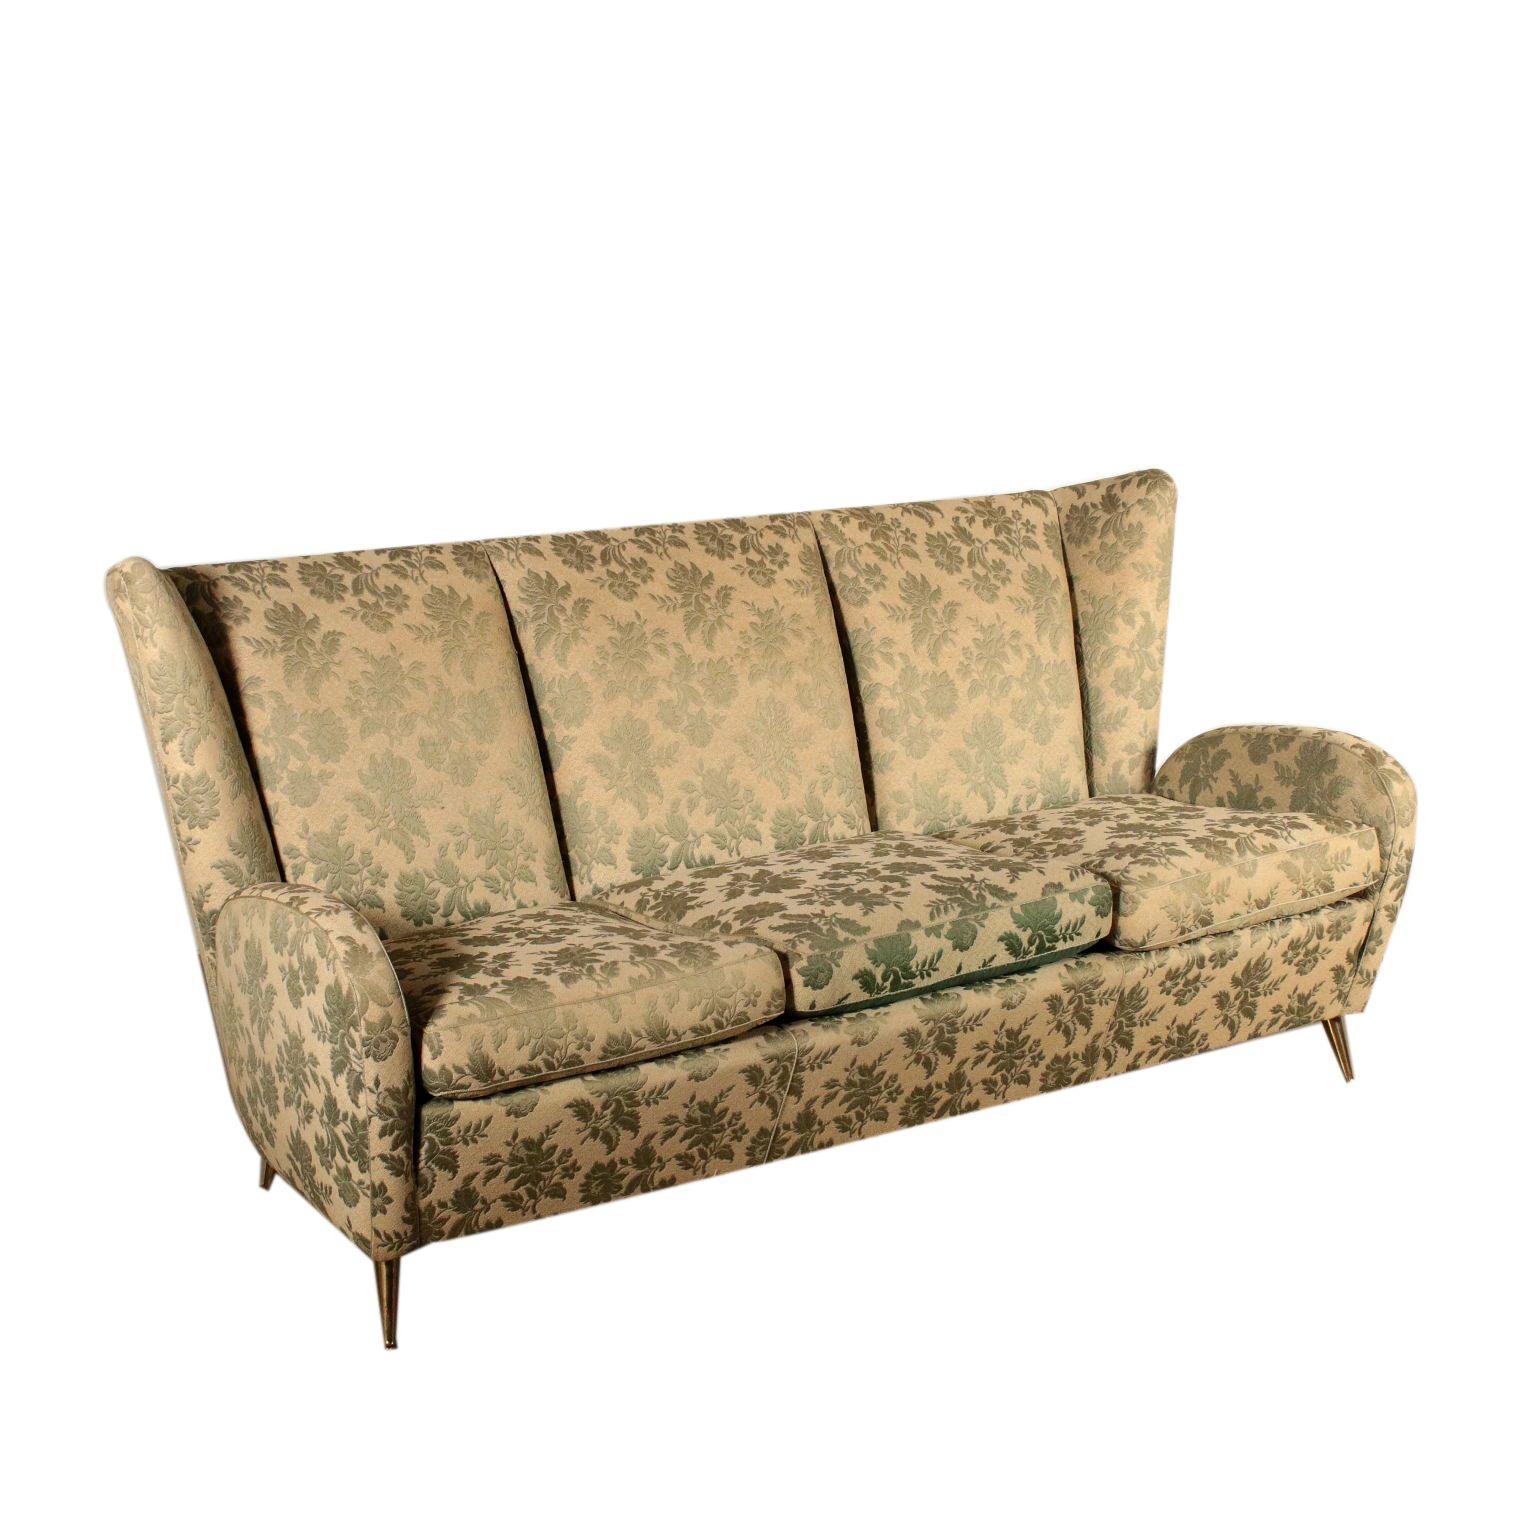 Canape En Style Paolo Buffa Ressorts Tissu Laiton Annees 50 Vintage Sofa Vintage Italy Modern Sofa Designs